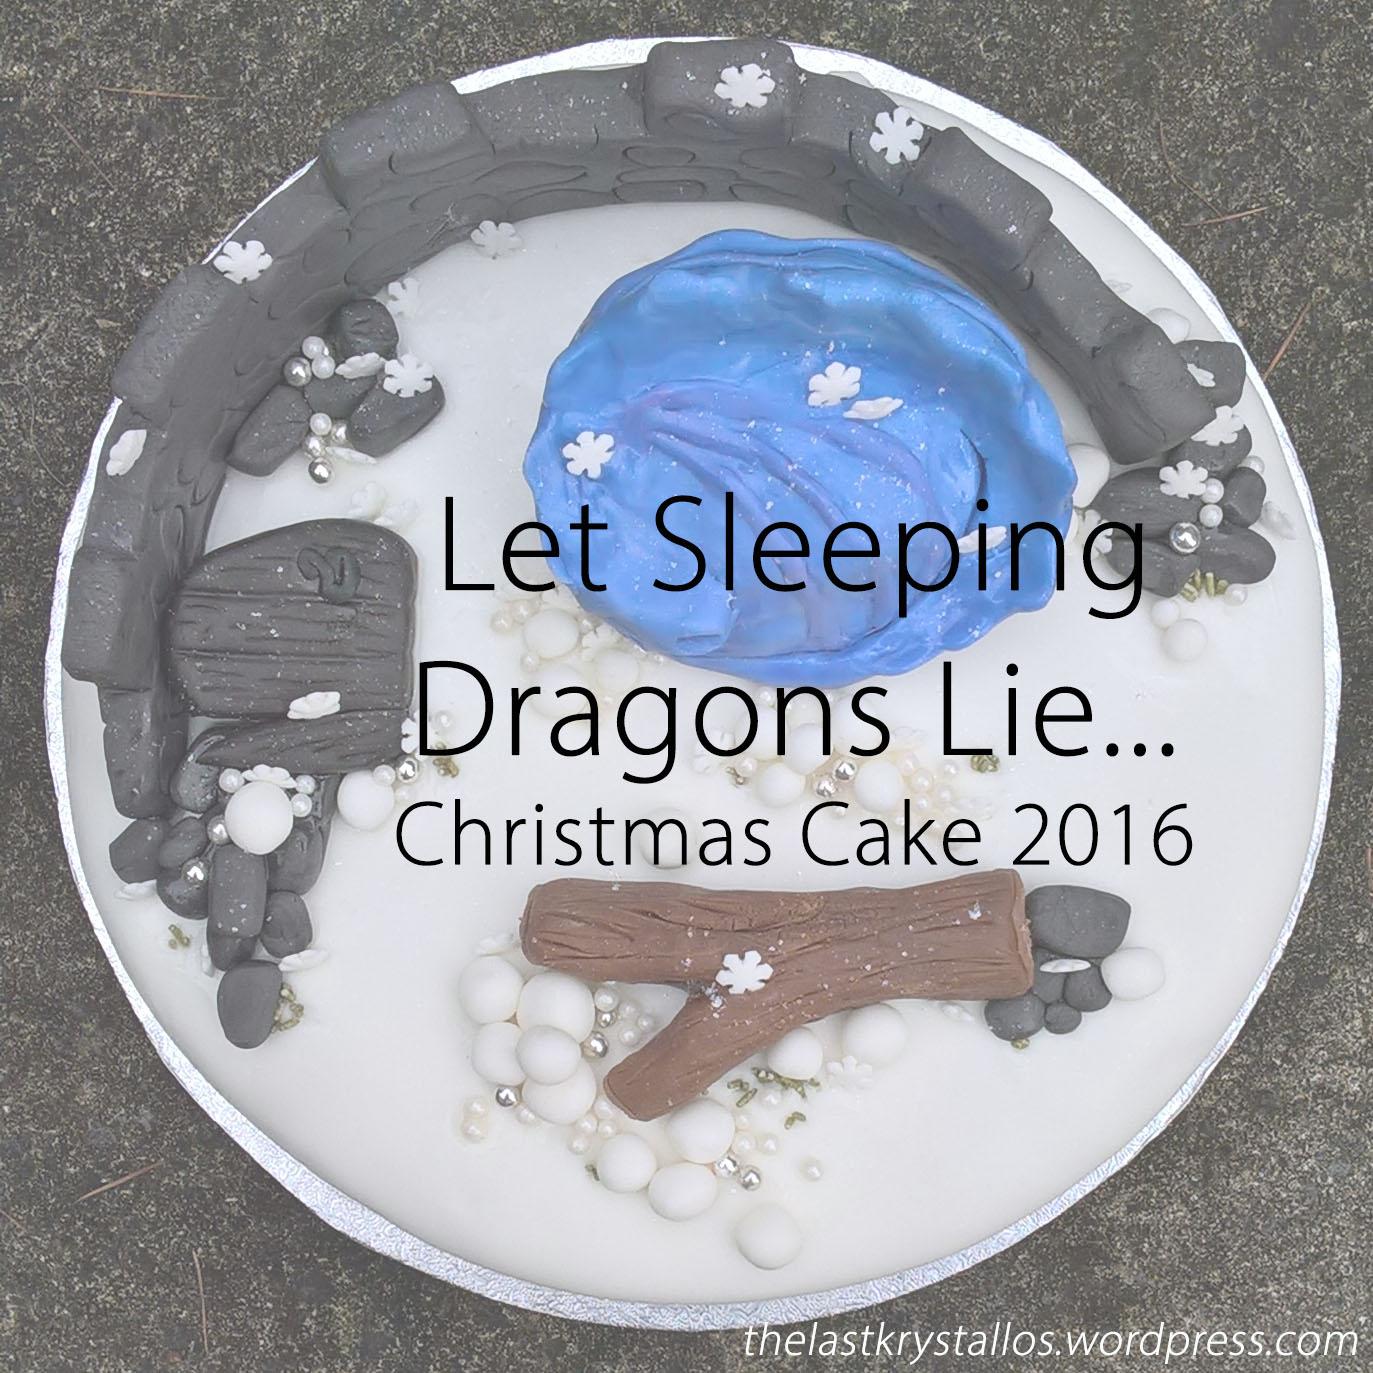 let-sleeping-dragons-lie-christmas-cake-2016-lisa-shambrook-the-last-krystallos